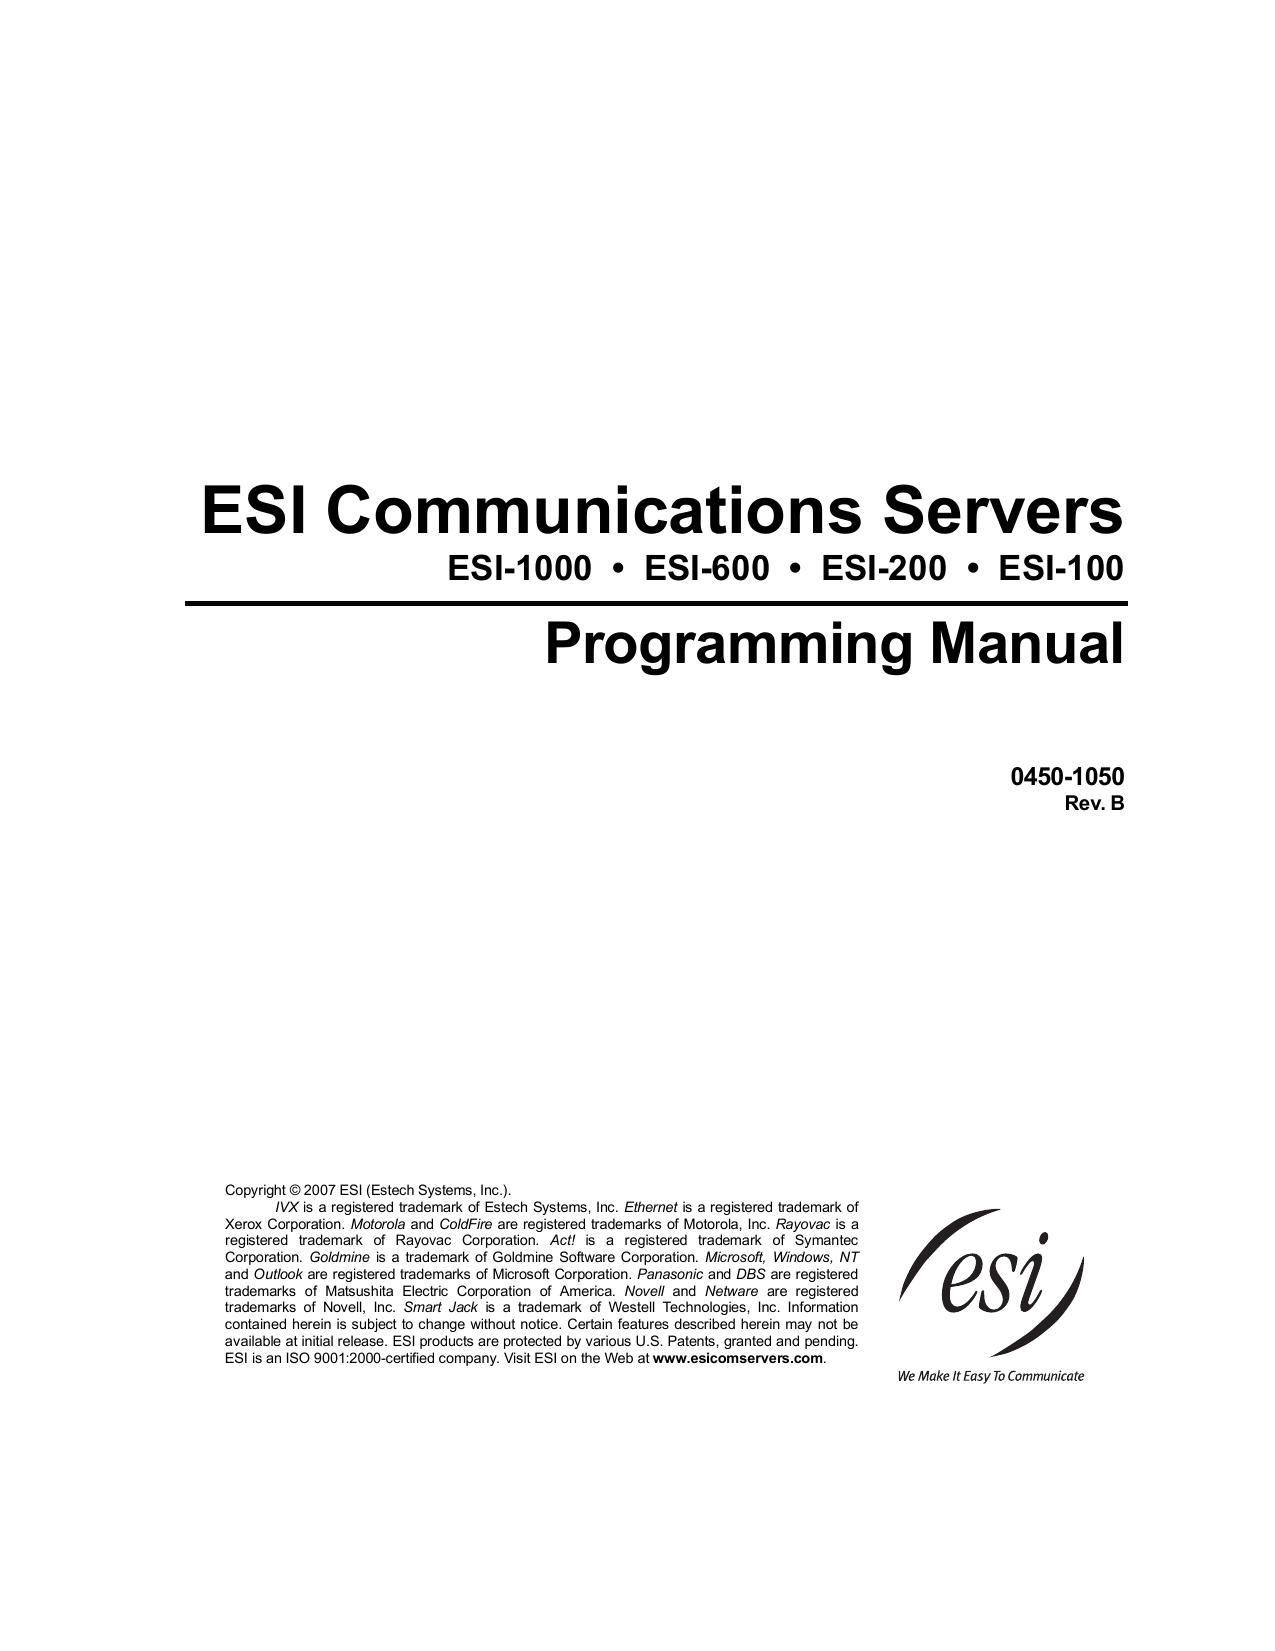 ESI Communications Servers Programming Manual   manualzz com